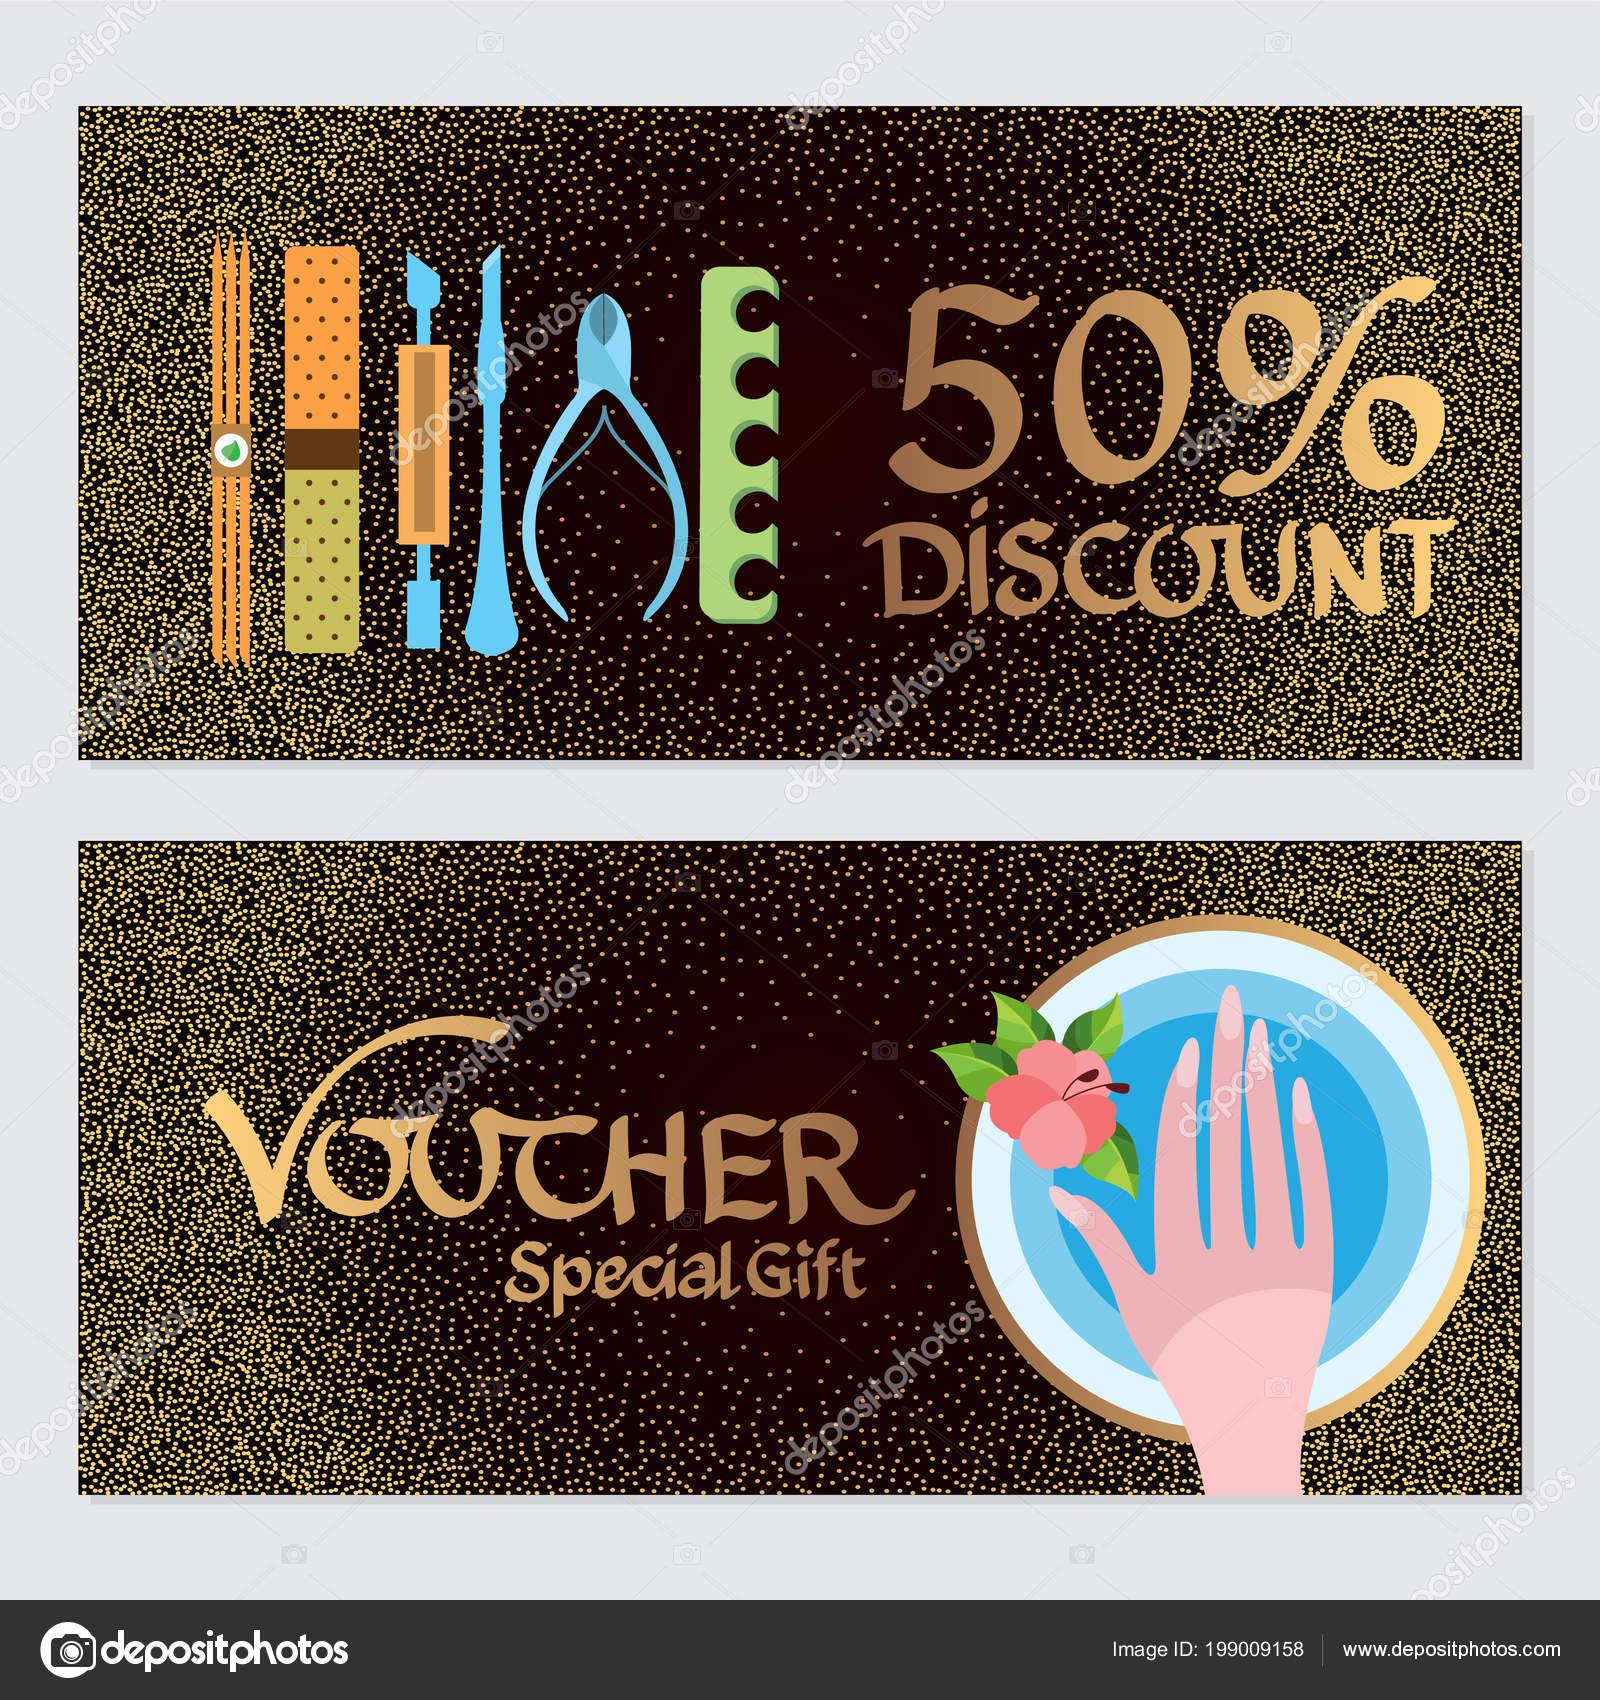 Discount Voucher Template Certificate Coupon Manicure Pedicure